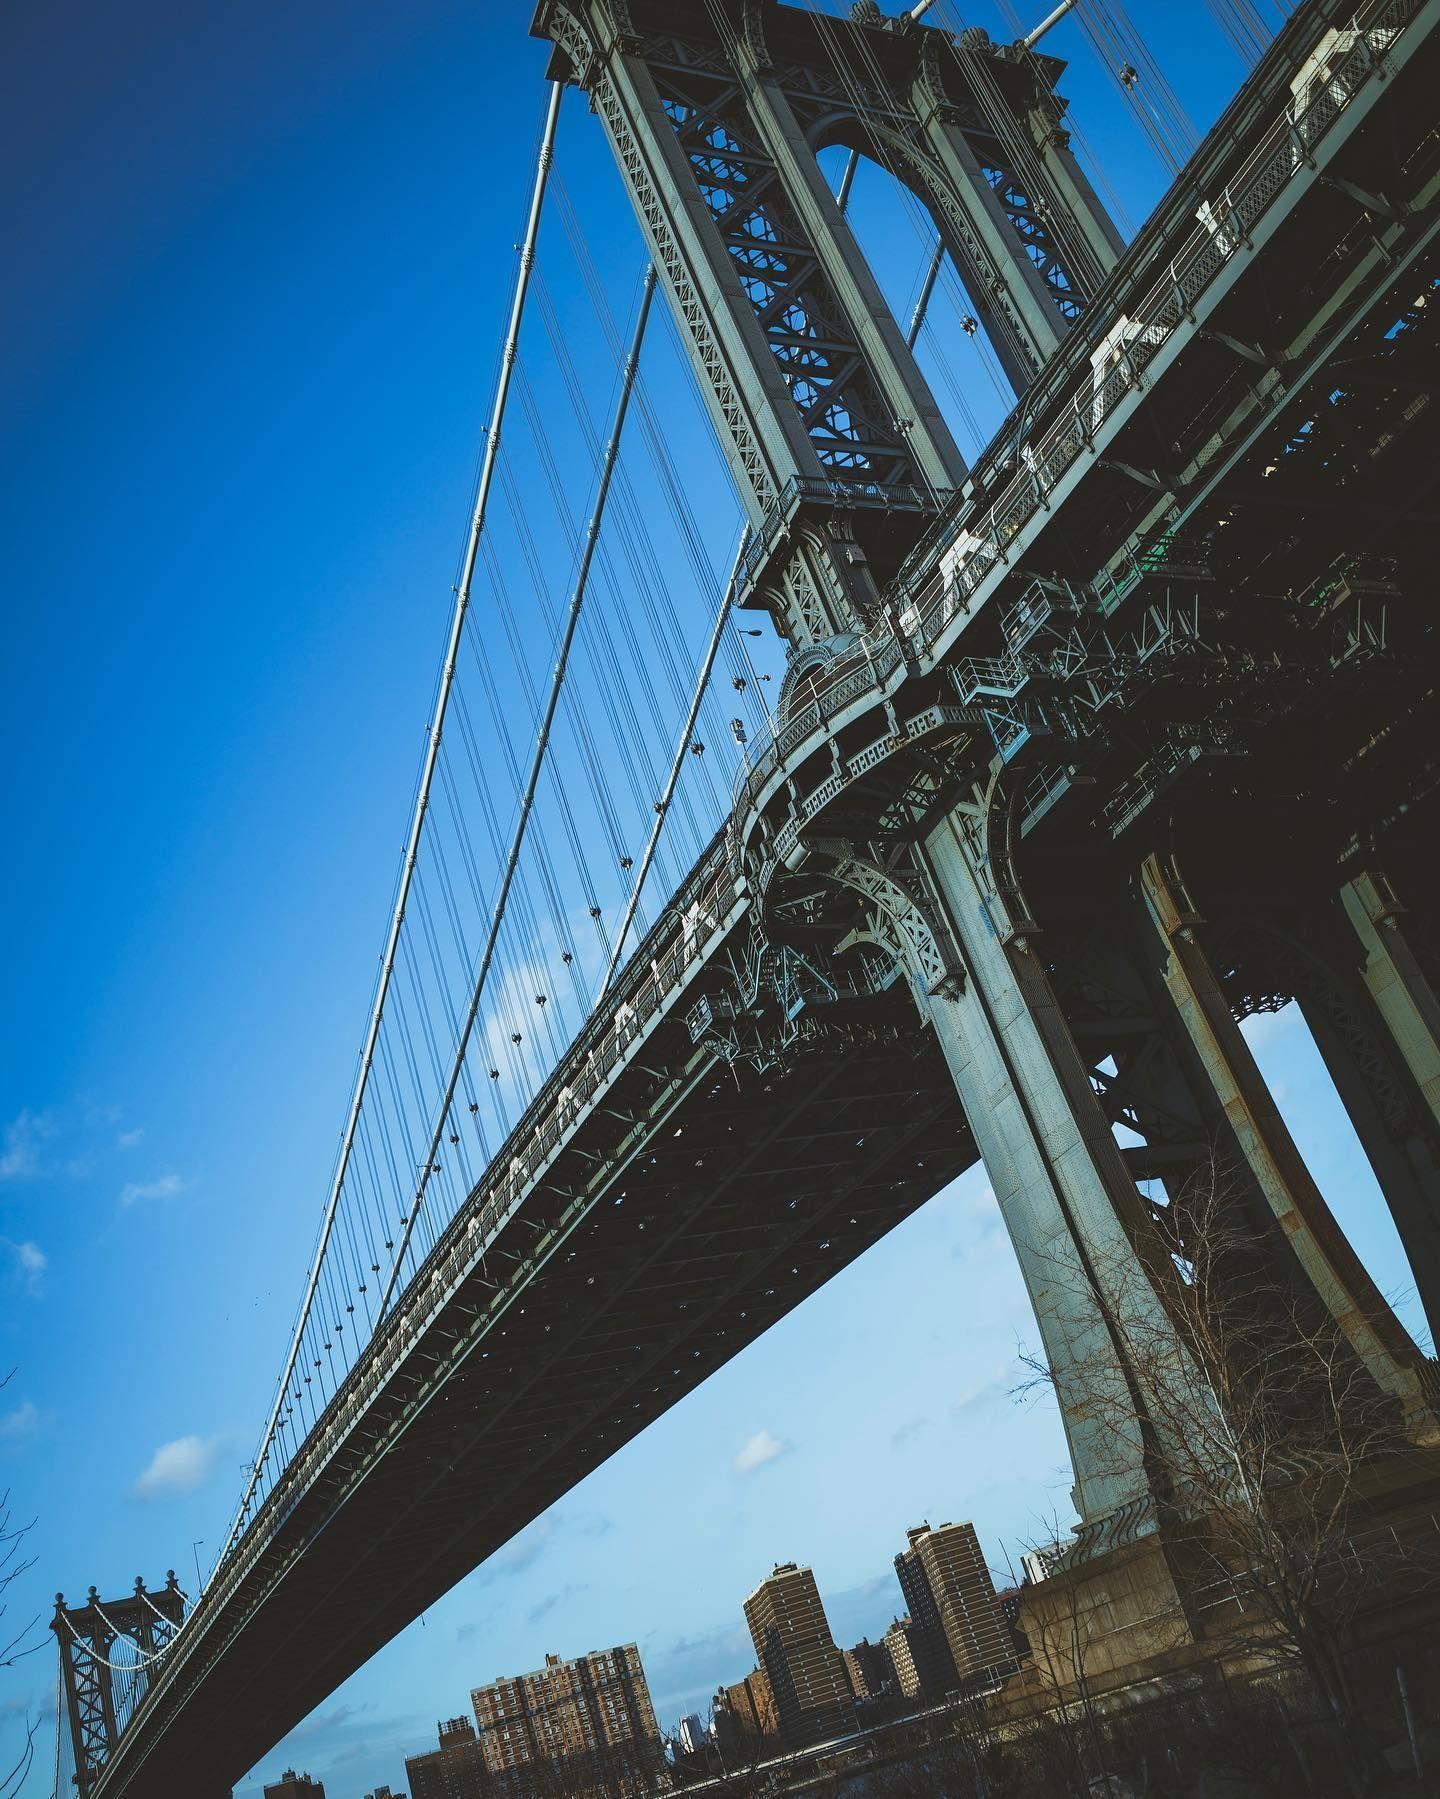 Manhattan Bridge in 2014  #onichie #osaka #japan #osakajapan #大阪 #日本 #オニッチ #おにっち #fromosaka #fromjapan #omg #onichiemusicgarage #ツァイスBatisで撮りたい #aestheticsjapan #shotonlexar #shotonnikon #nikon #ニコン #sigmalens #シグマレンズ #ricoh #ricohgr #gr #grist #newyork #newyorkcity #nyc #brooklyn #manhattanbridge